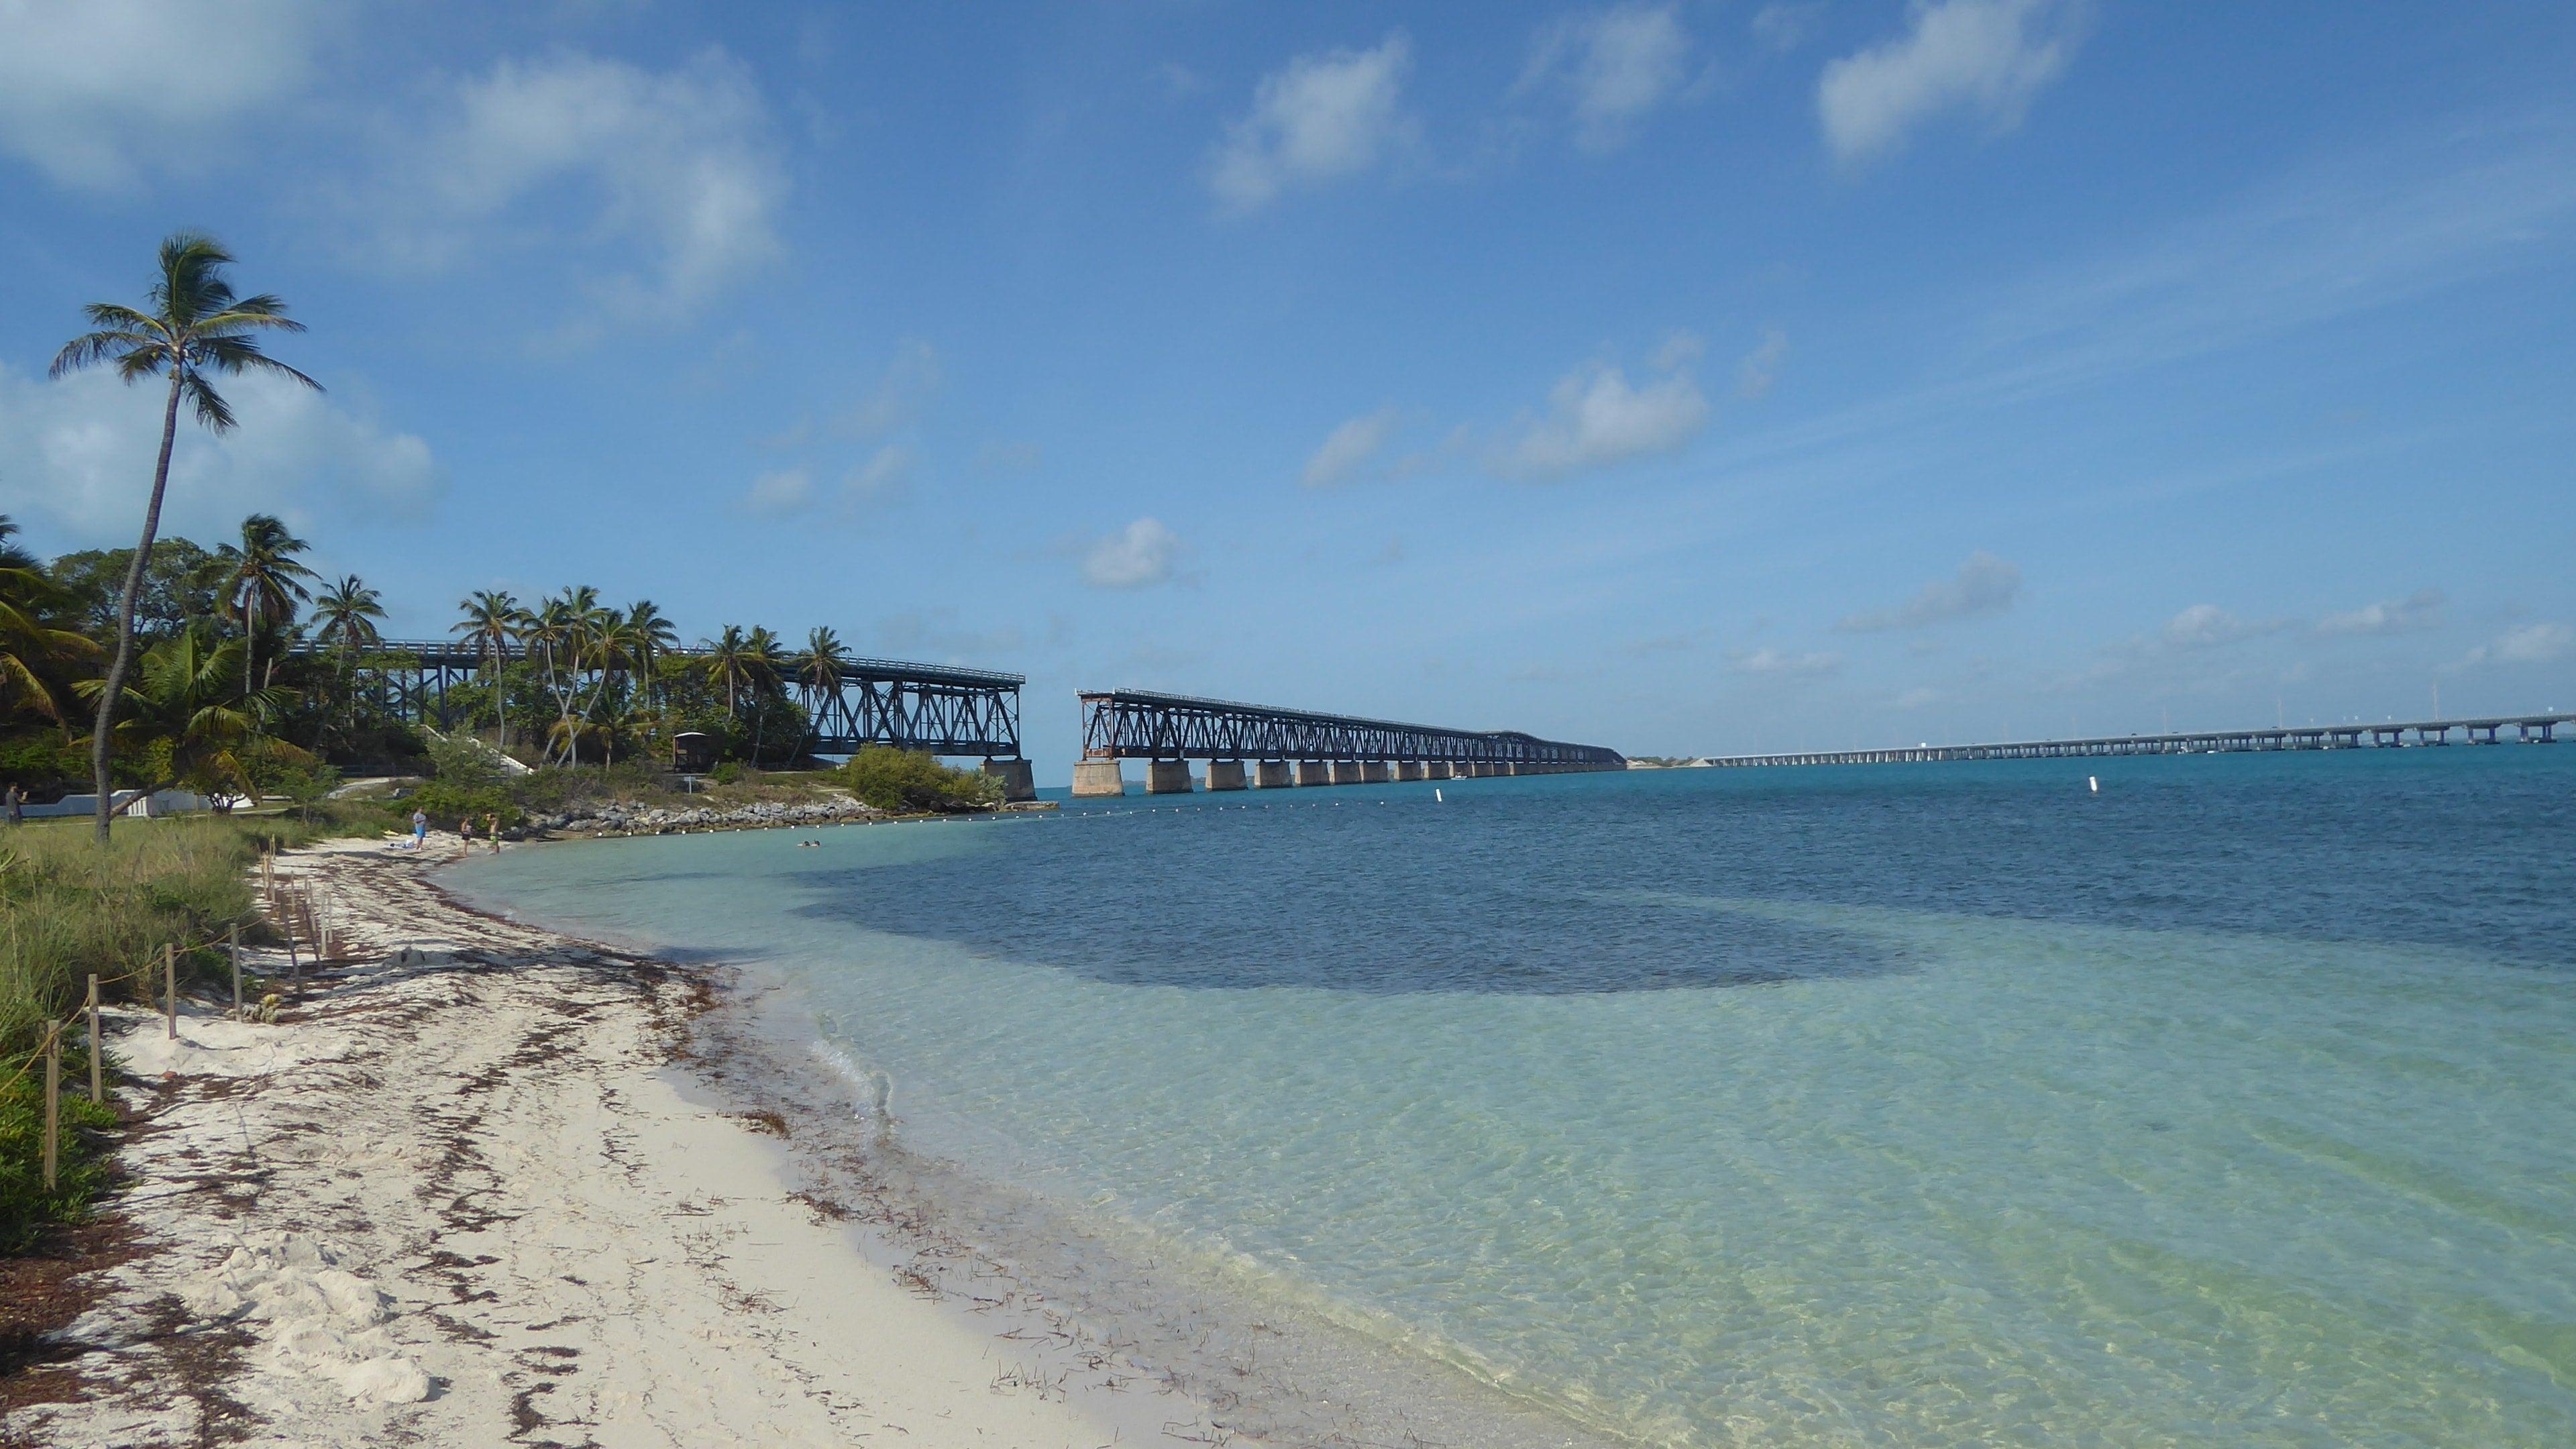 Personal Injury Lawyers In Key West Florida Fl Morgan Morgan